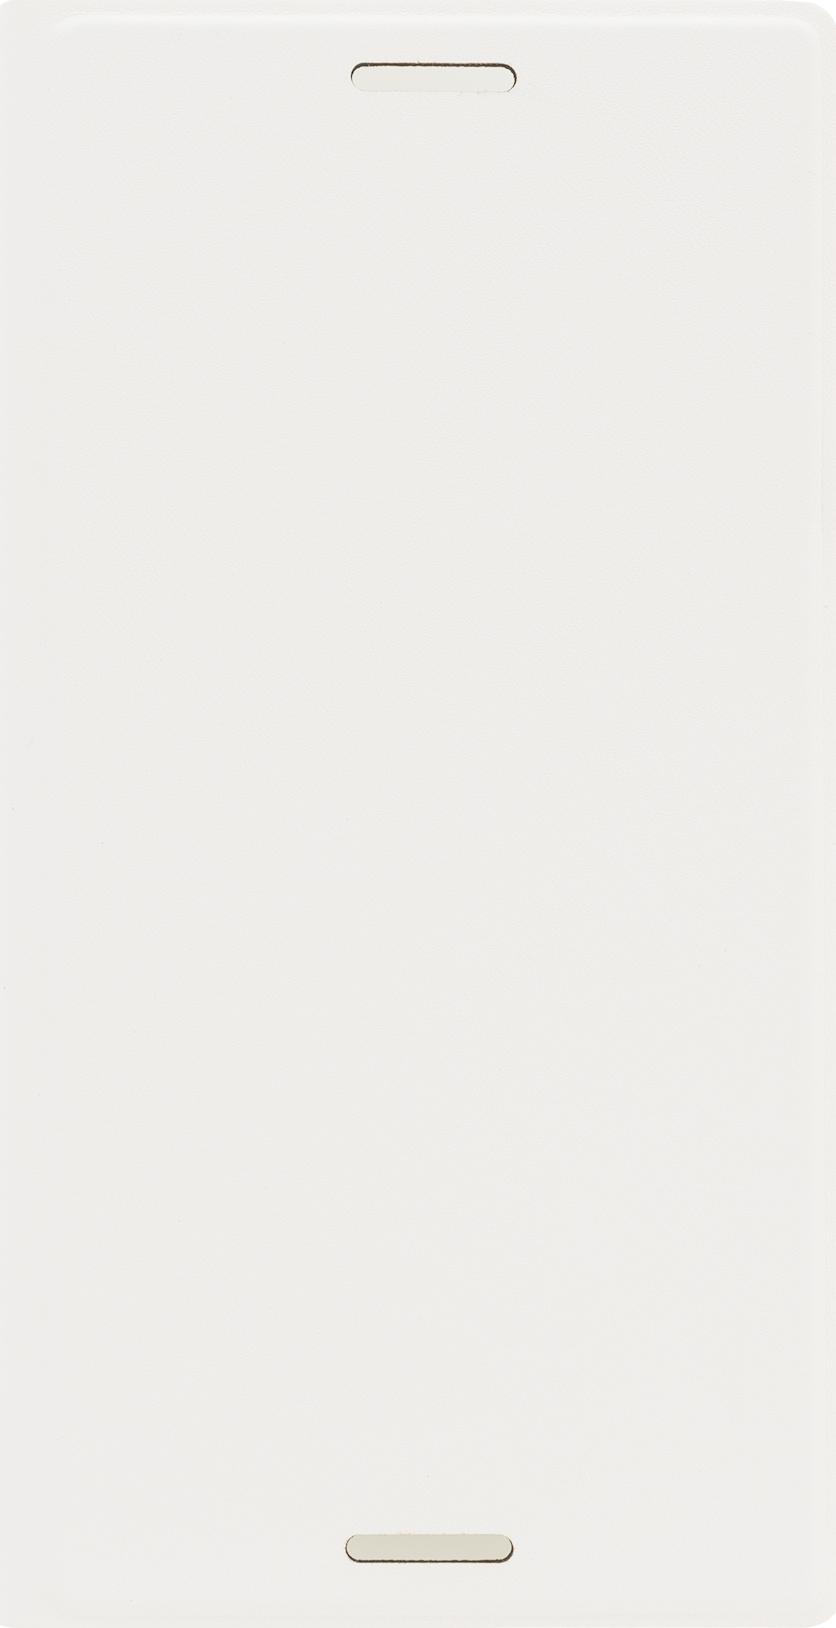 Чехол Brosco Book для Sony Xperia X Compact, белый цена и фото